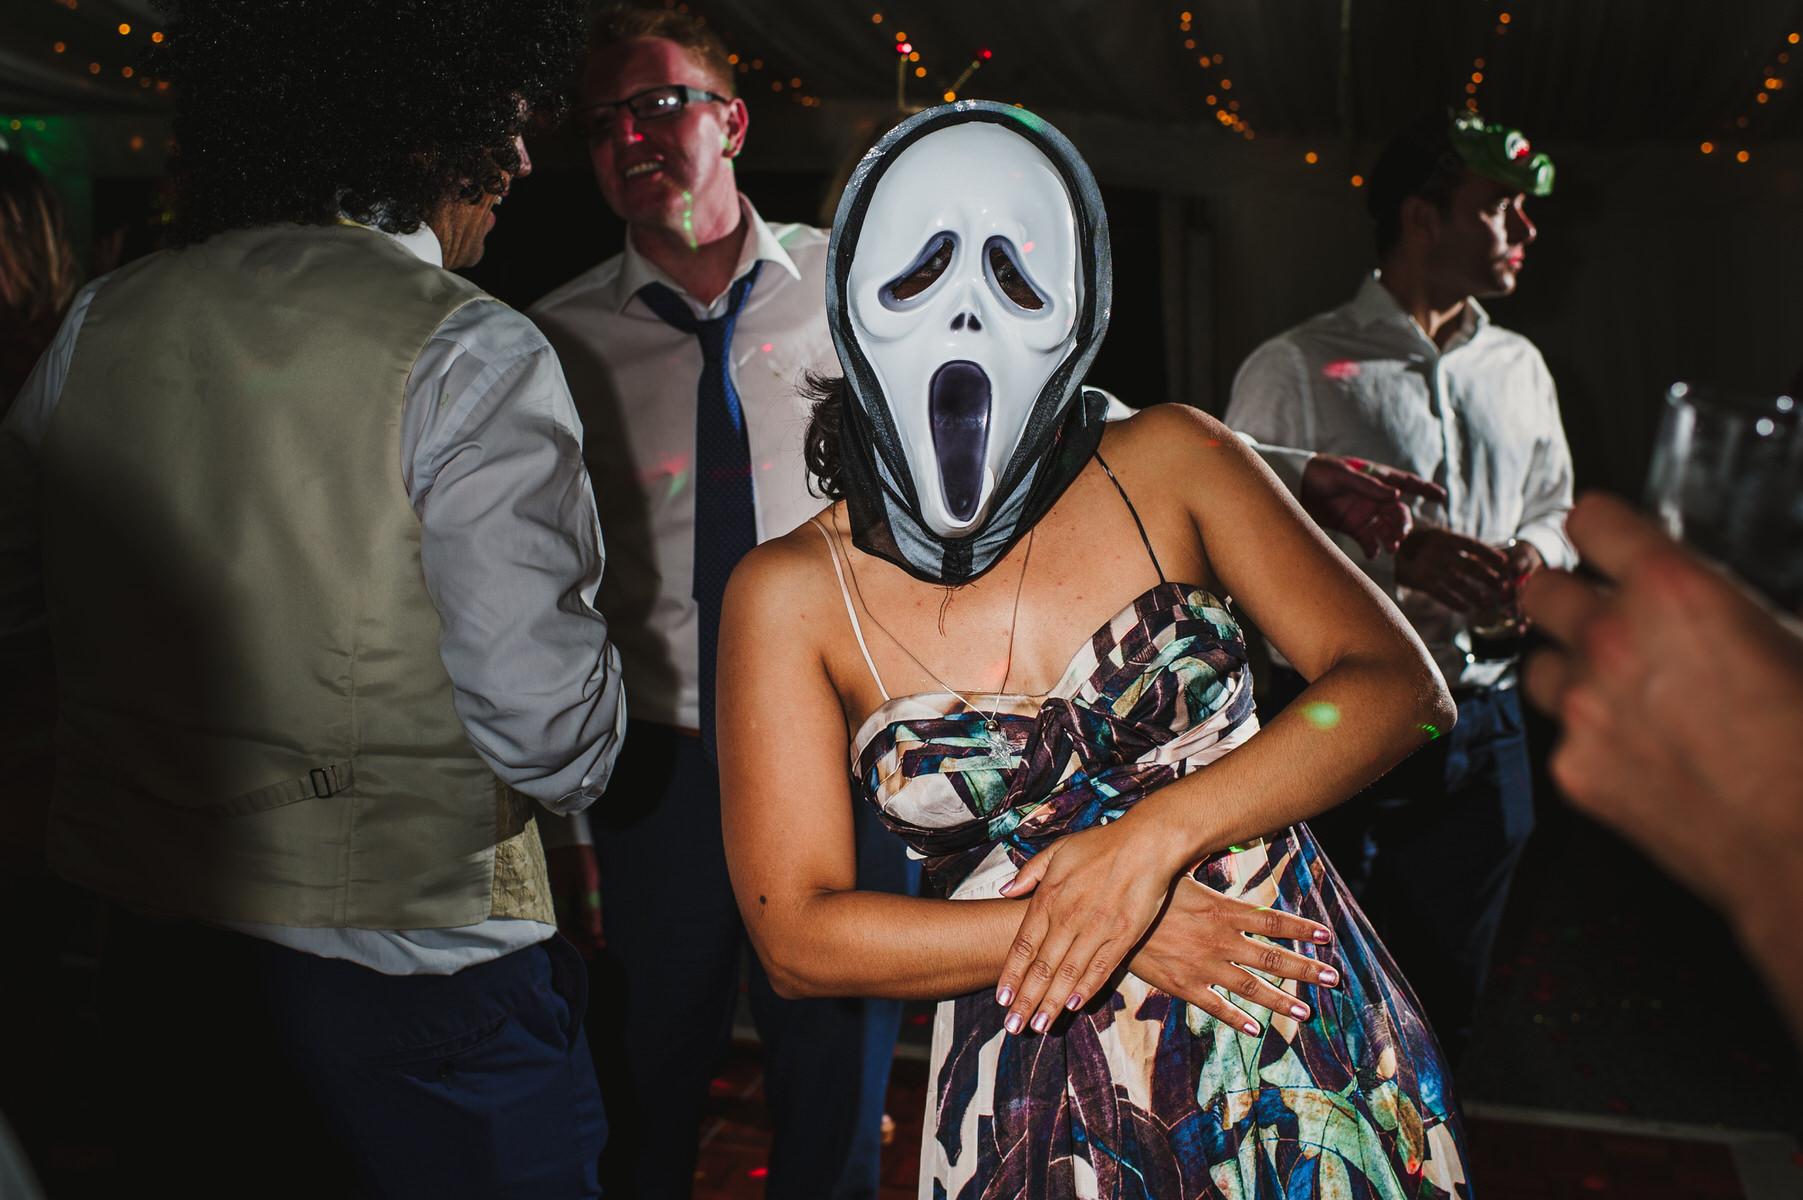 Ravens Ait wedding reception